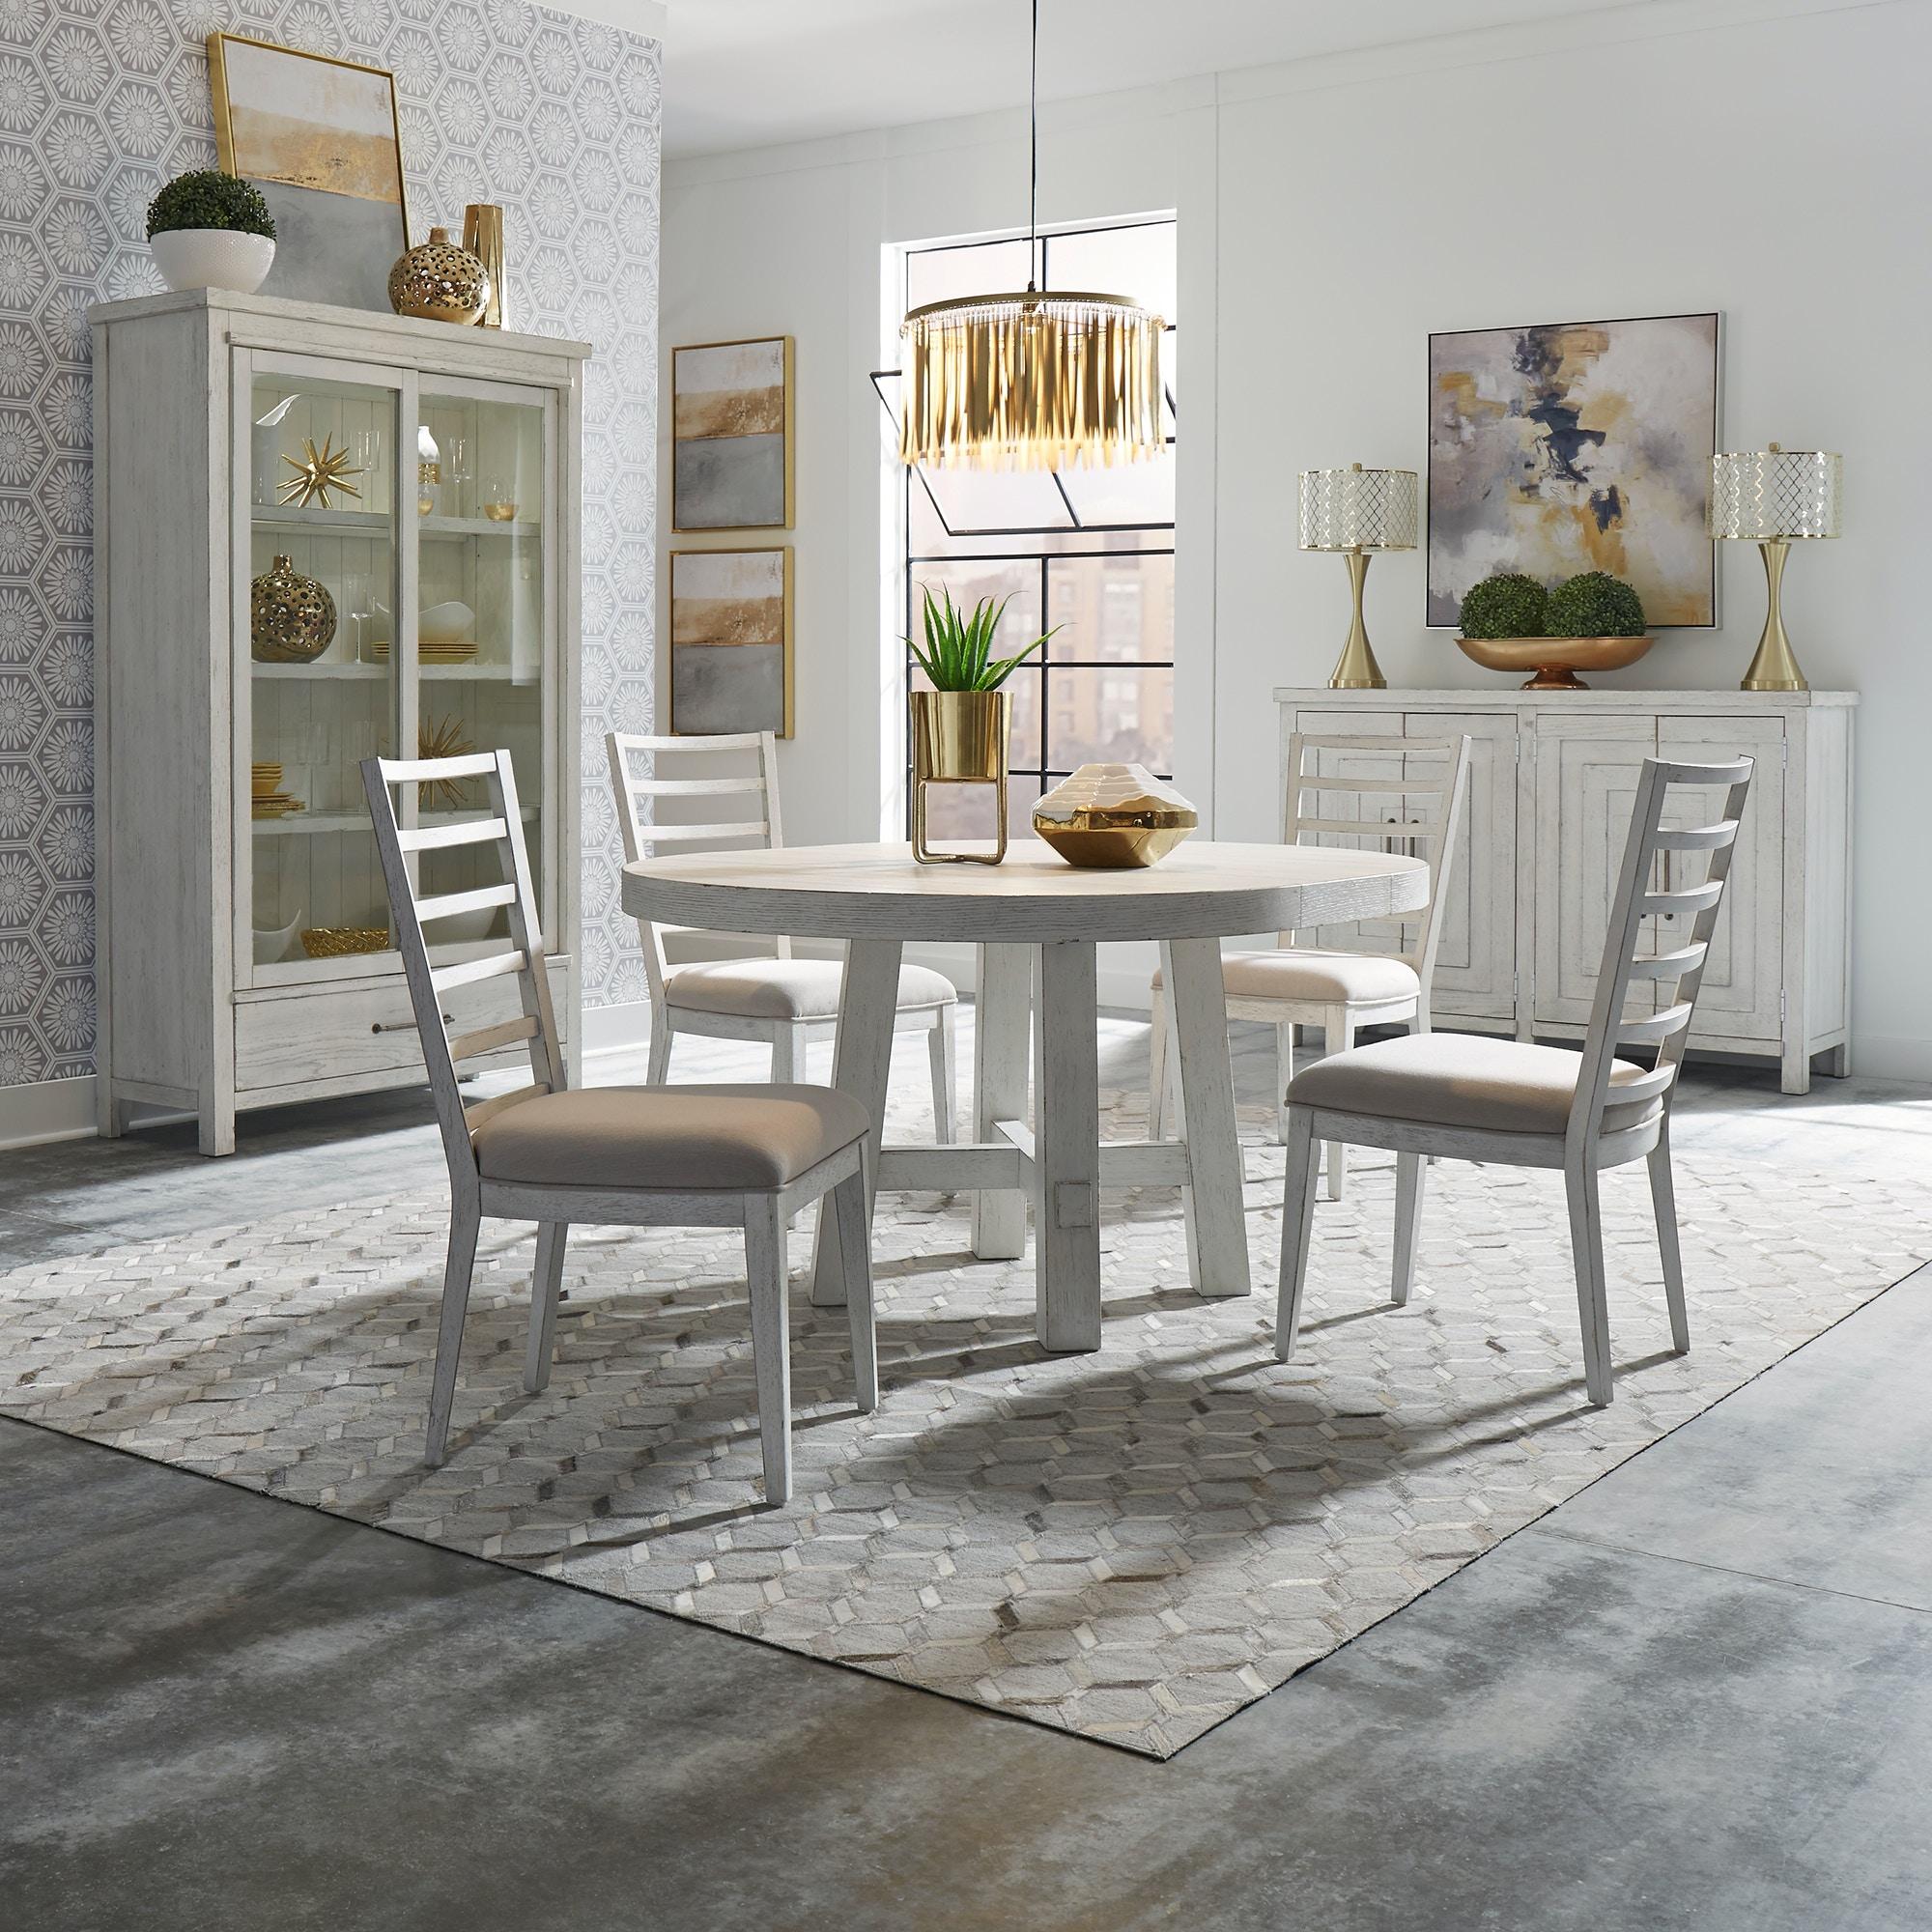 Liberty Furniture Dining Room Modern Farmhouse White 9 Piece Round ...